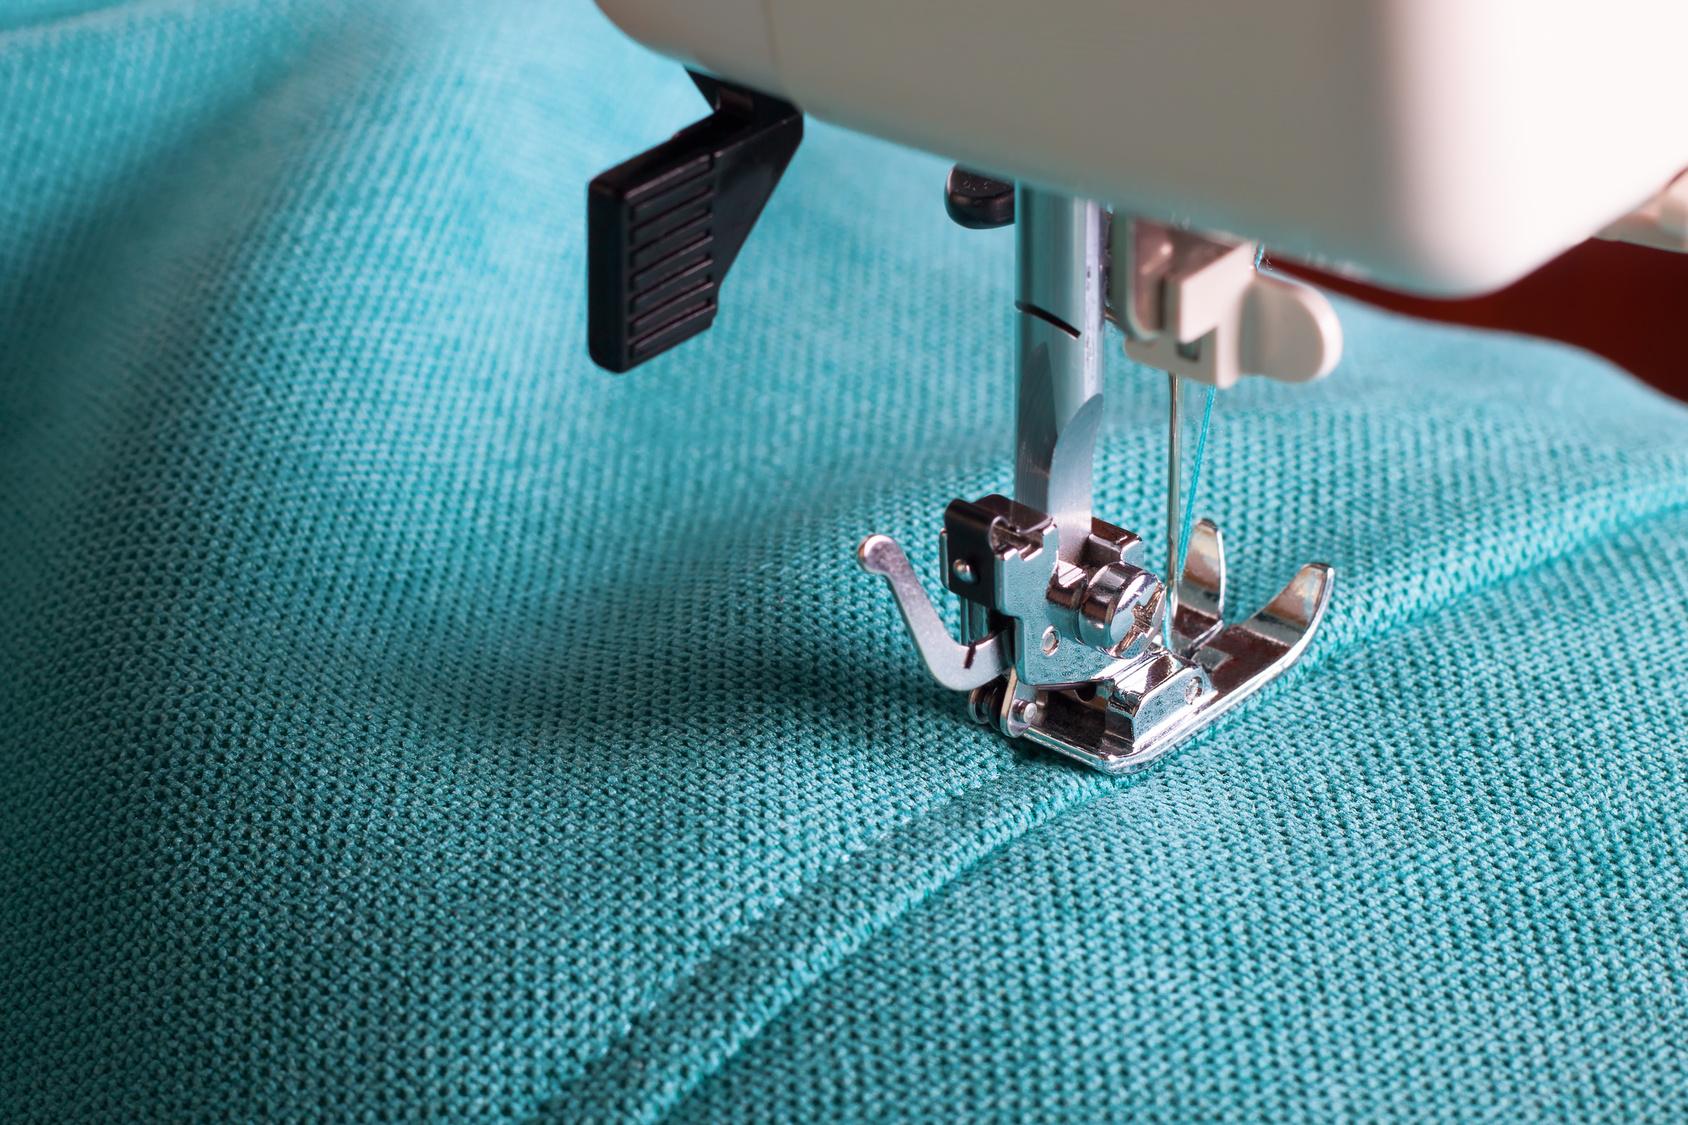 Sewing machine stitching a seam in a light blue cosplay fabric